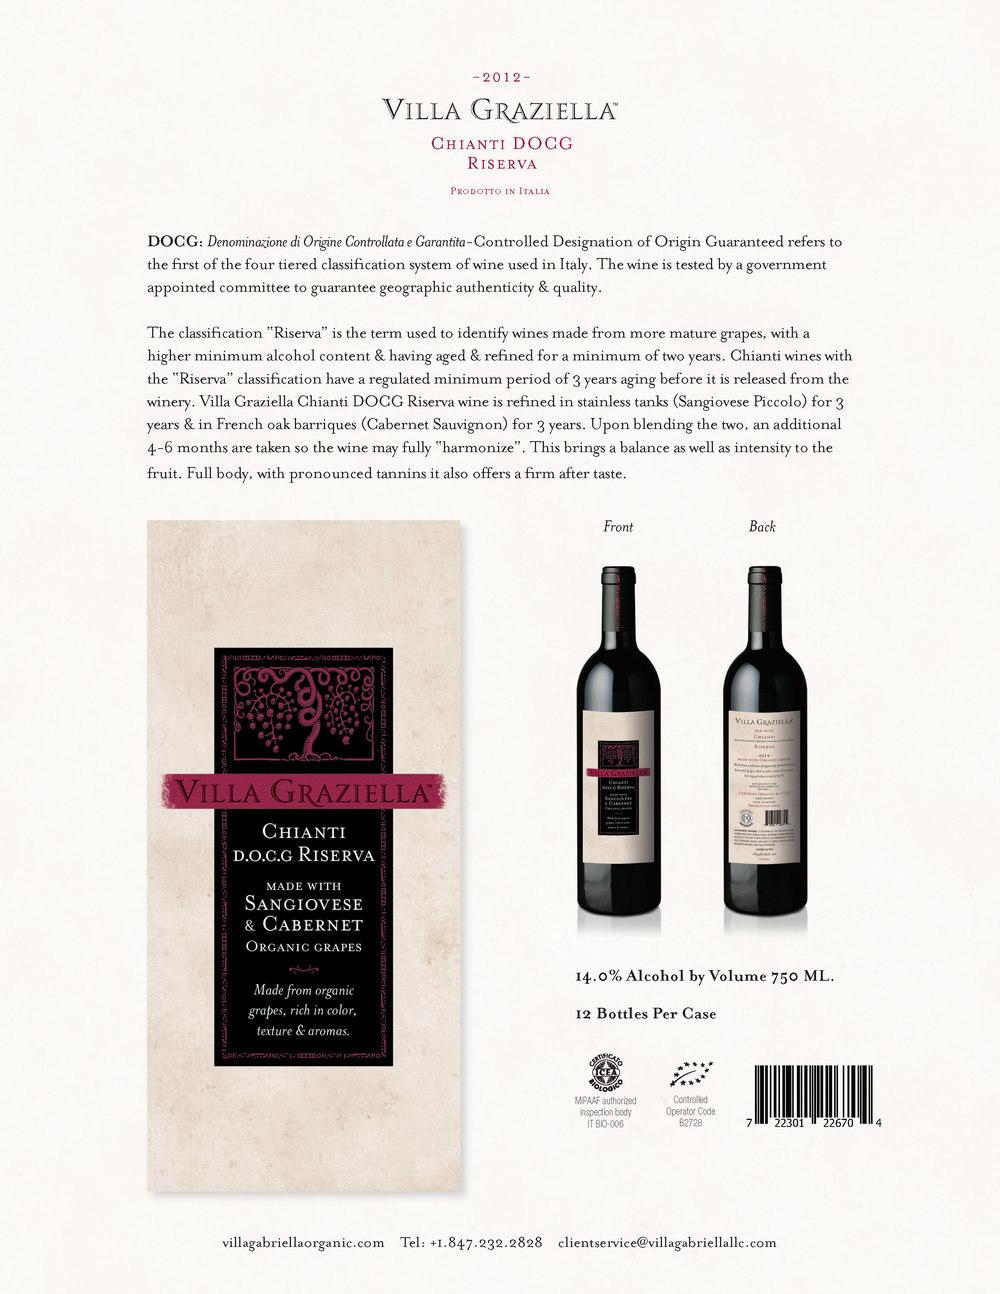 -2012- Chianti DOCG Riserva Sell Sheet